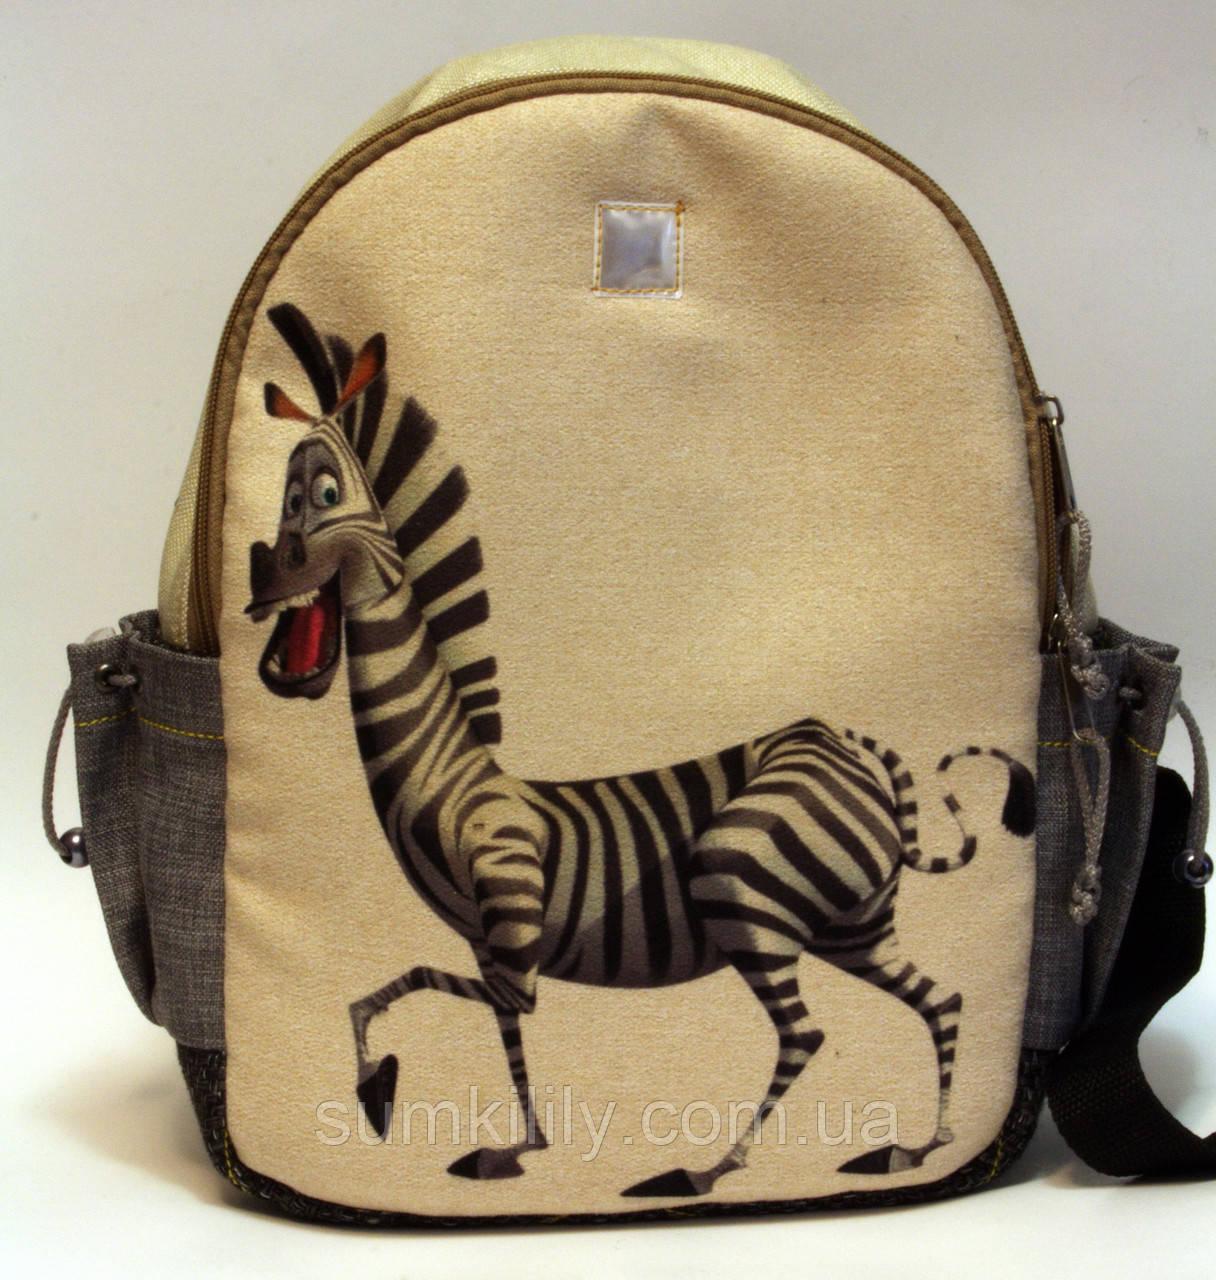 Детский рюкзак Мартин Мадагаскар, фото 1